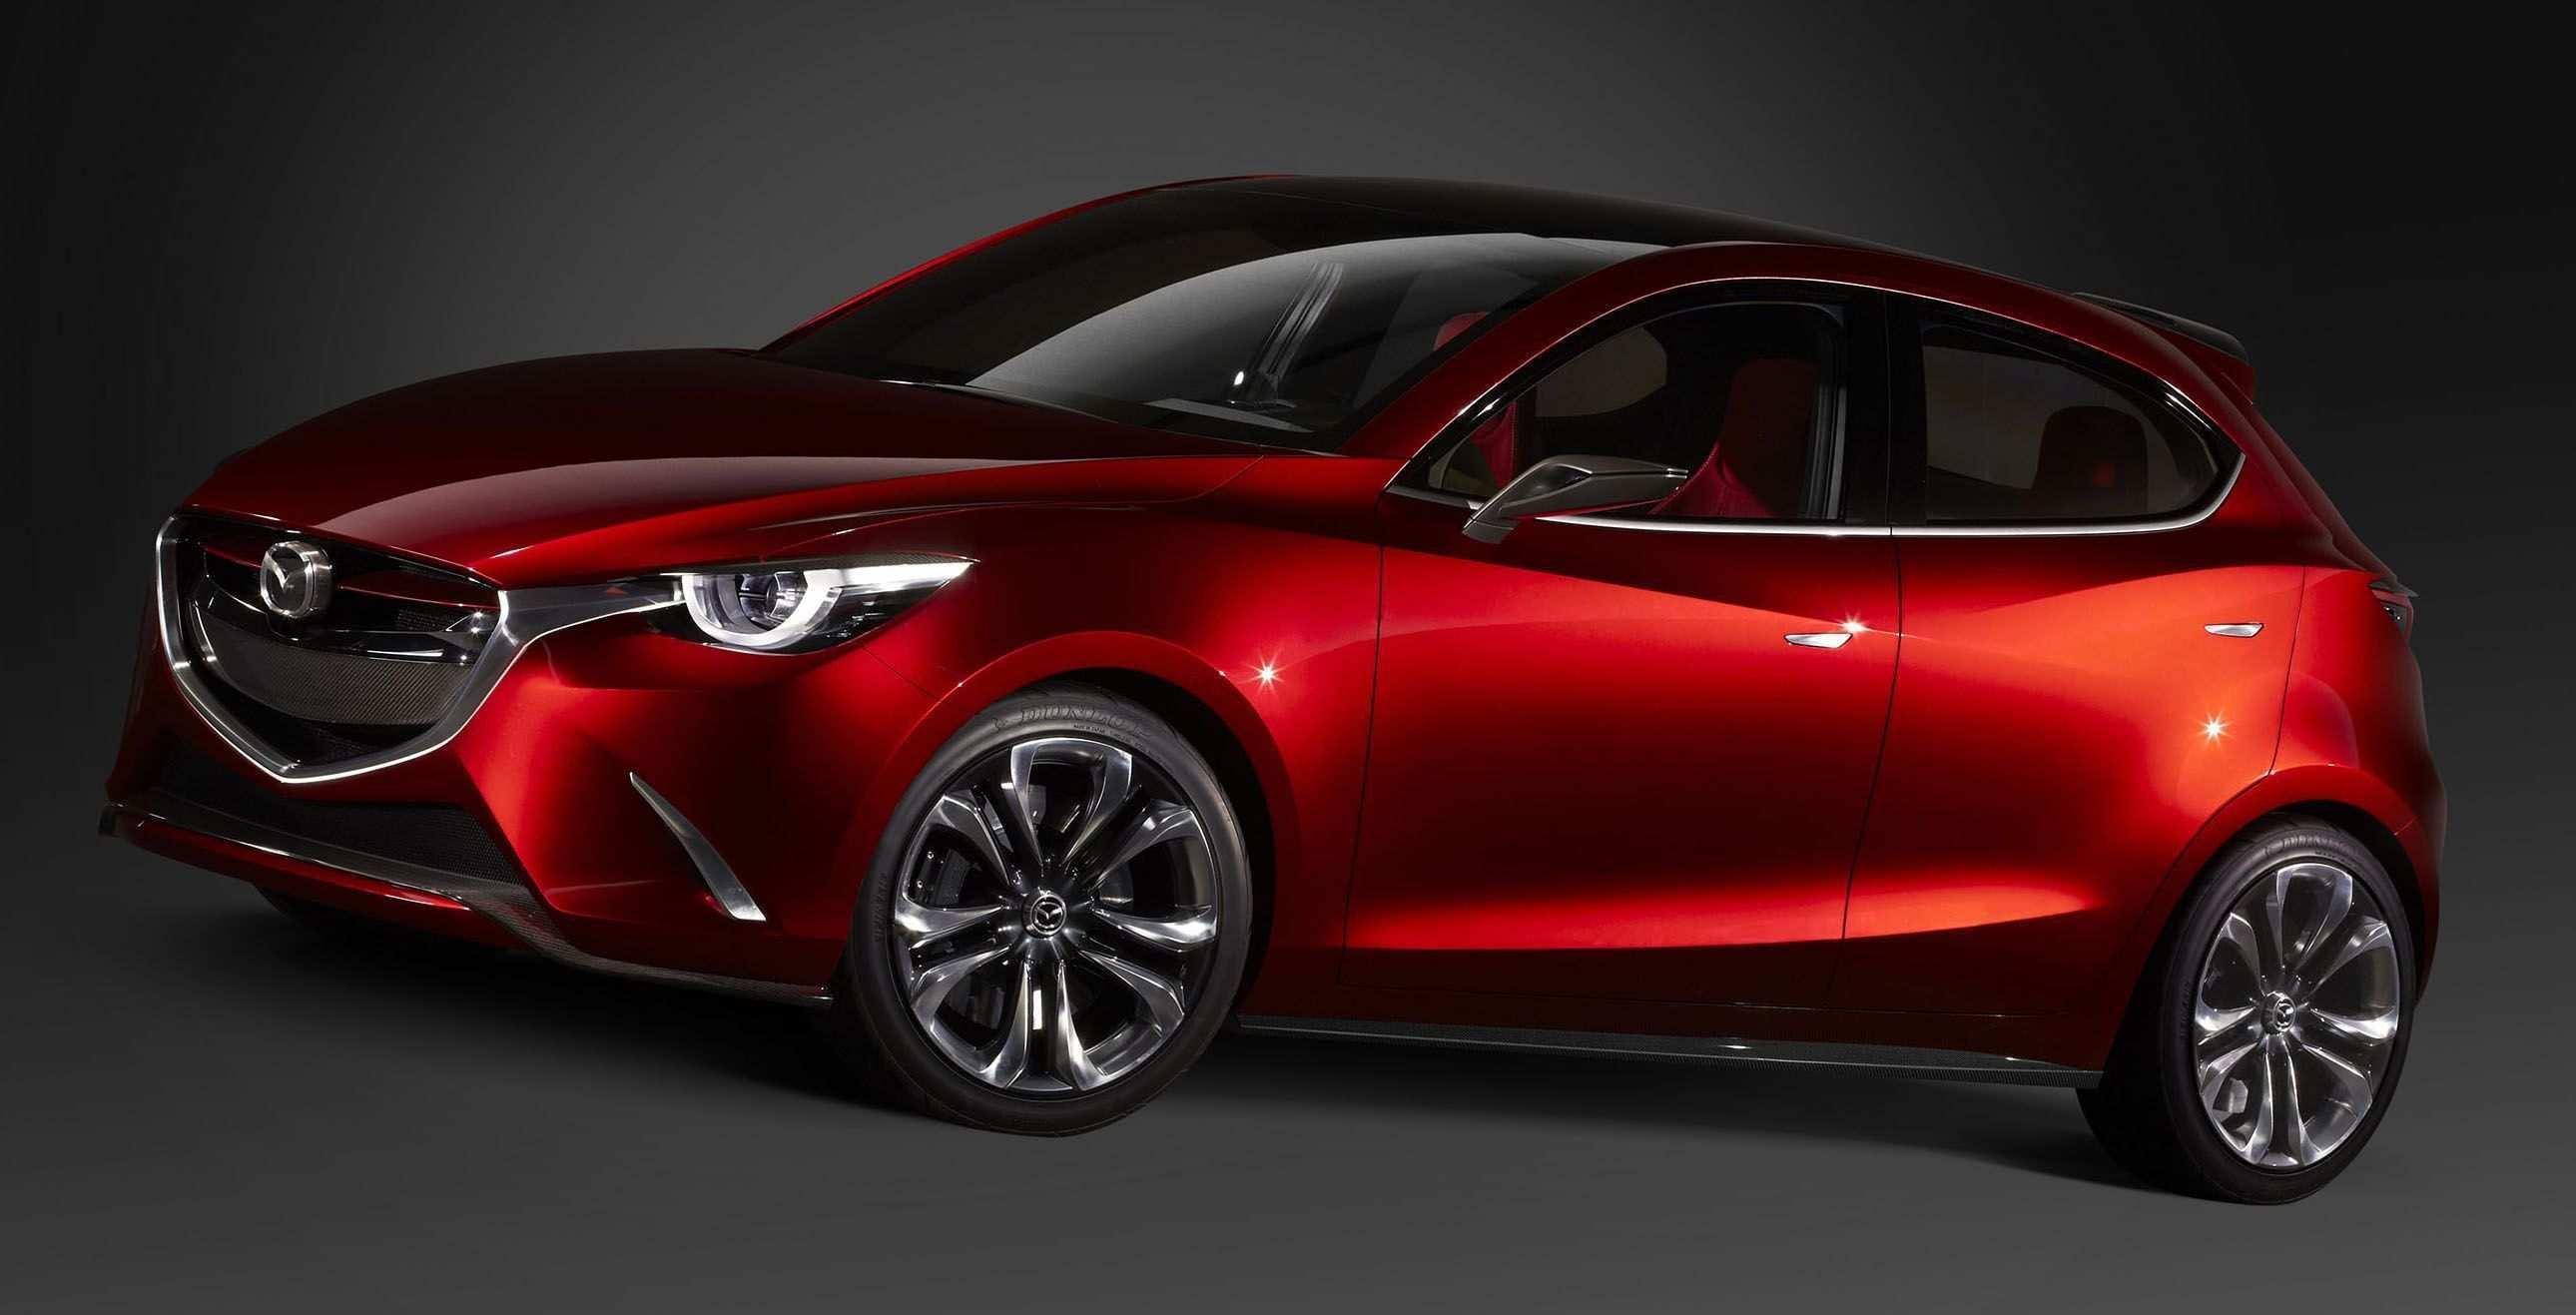 23 Best Review Mazda Demio 2020 Configurations by Mazda Demio 2020